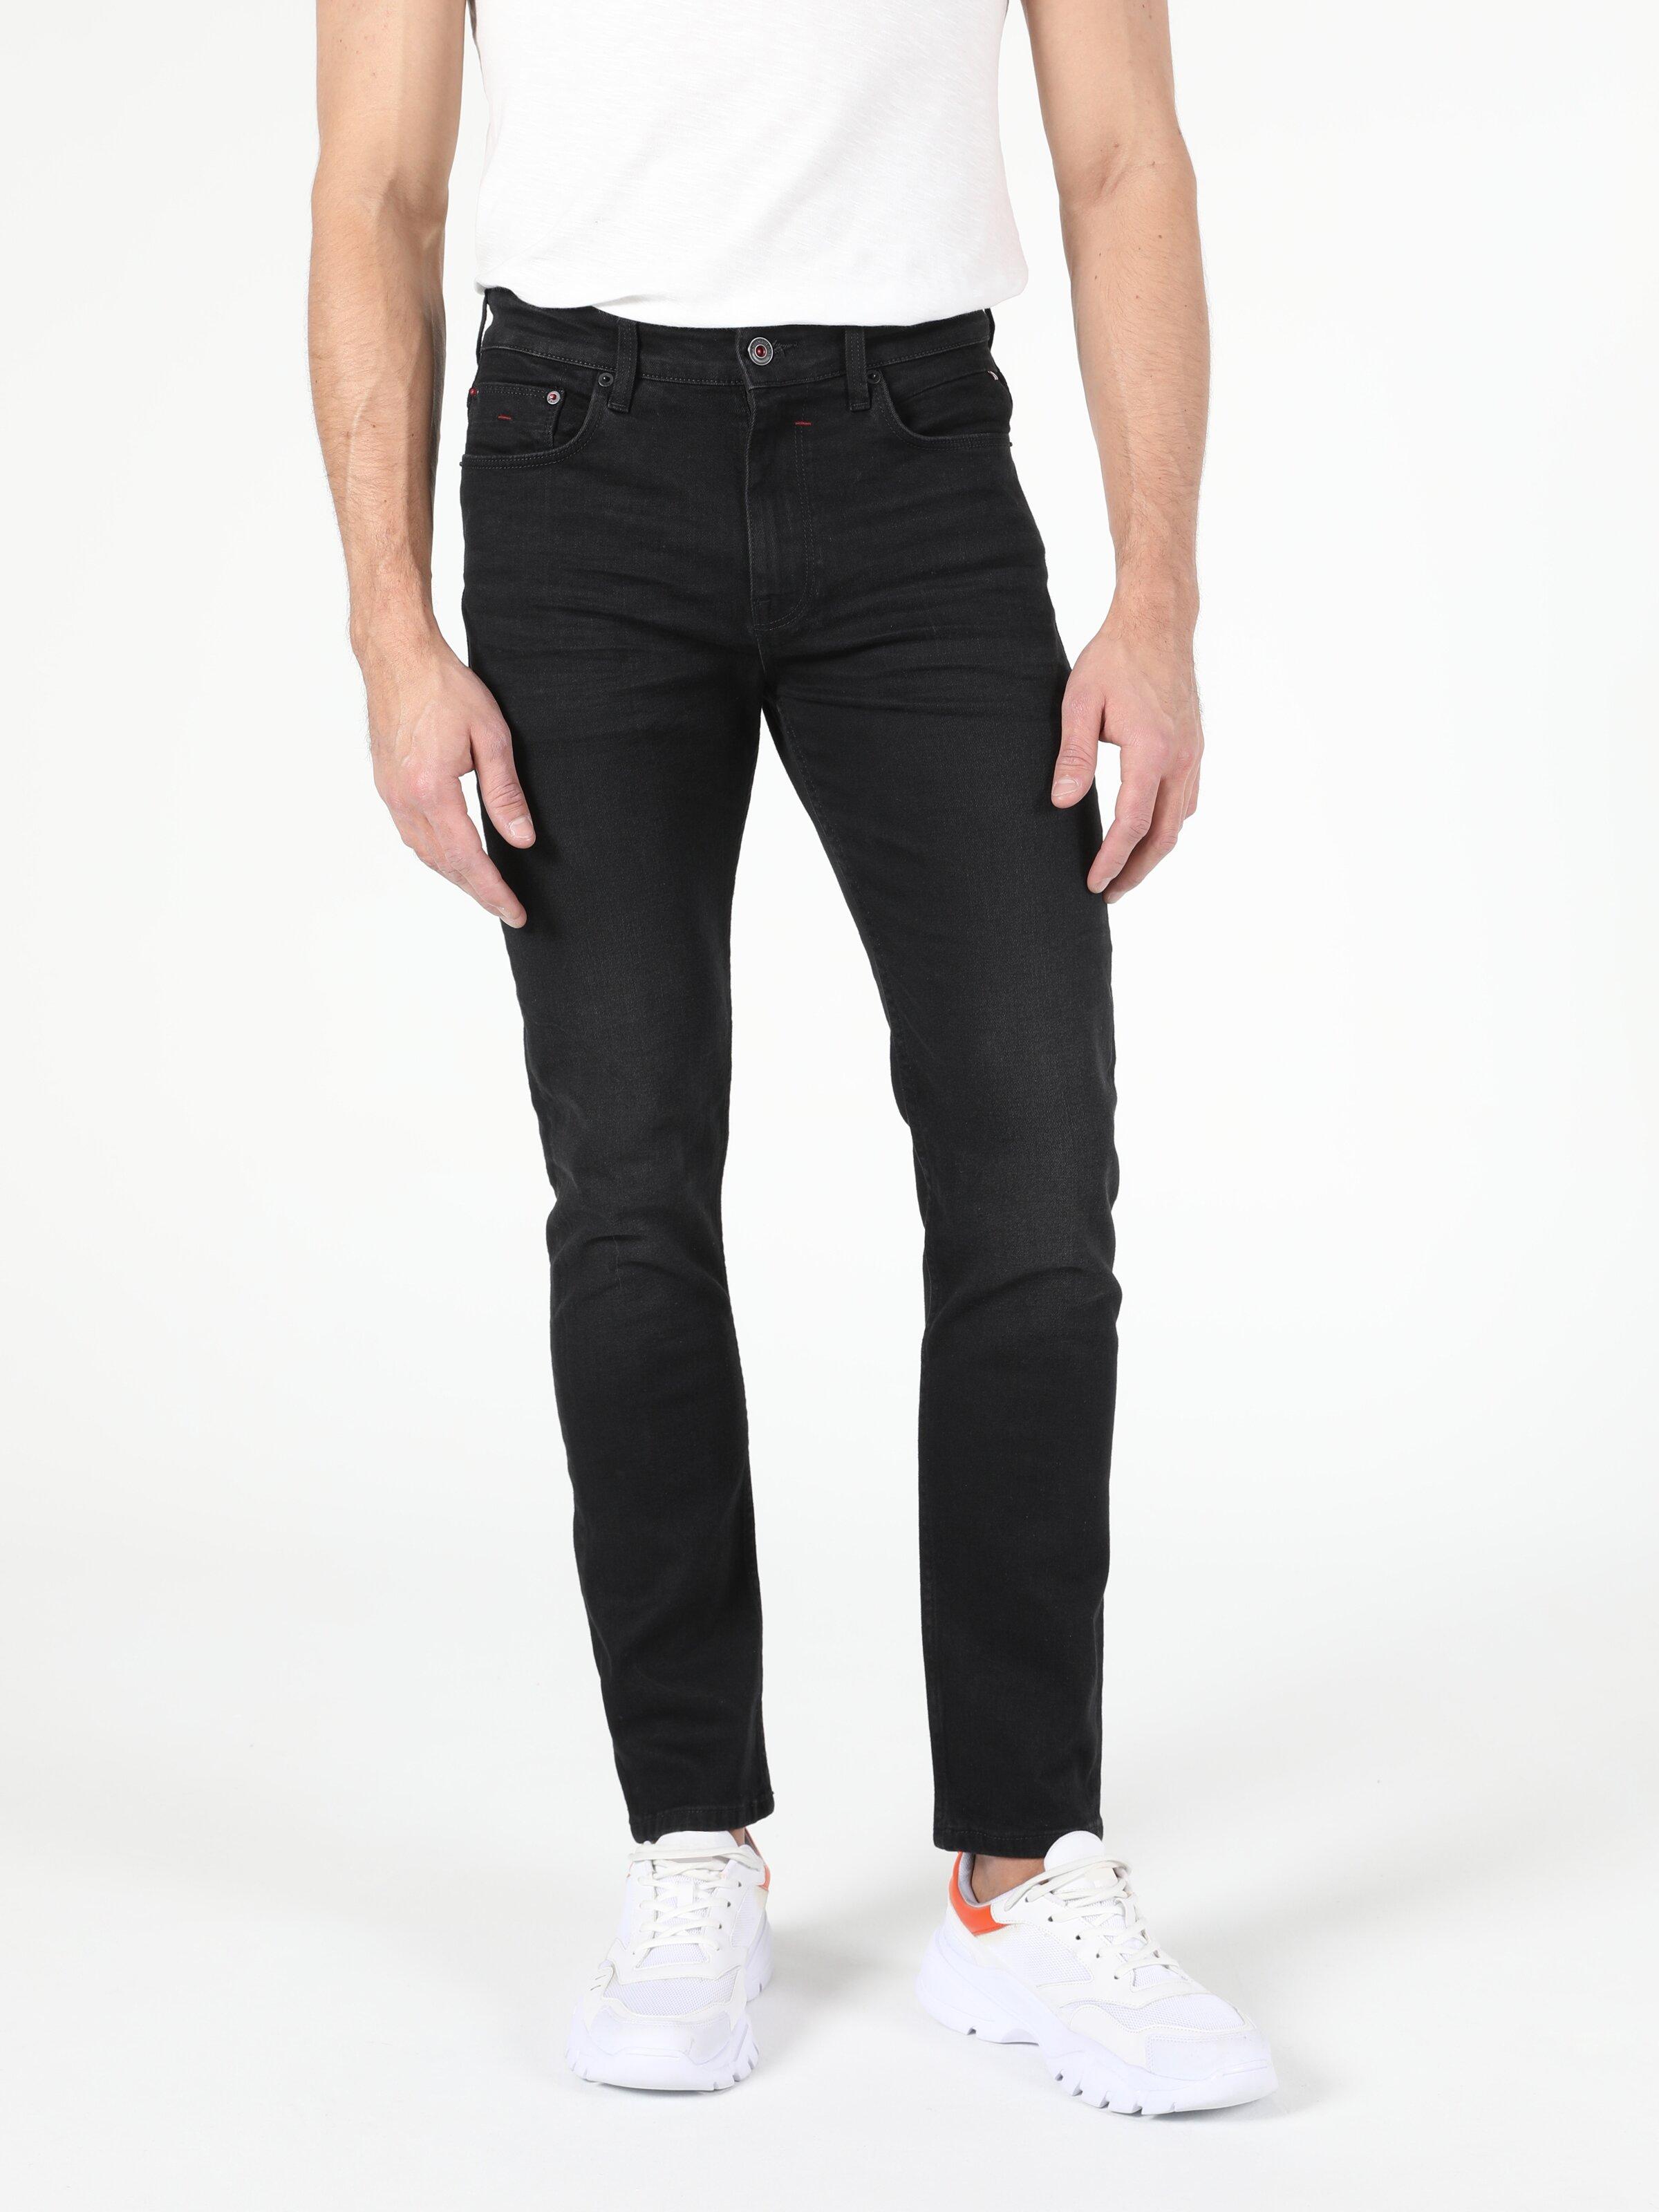 035 Ryan Yüksek Bel Dar Paça Skinny Fit Siyah Erkek Jean Pantolon